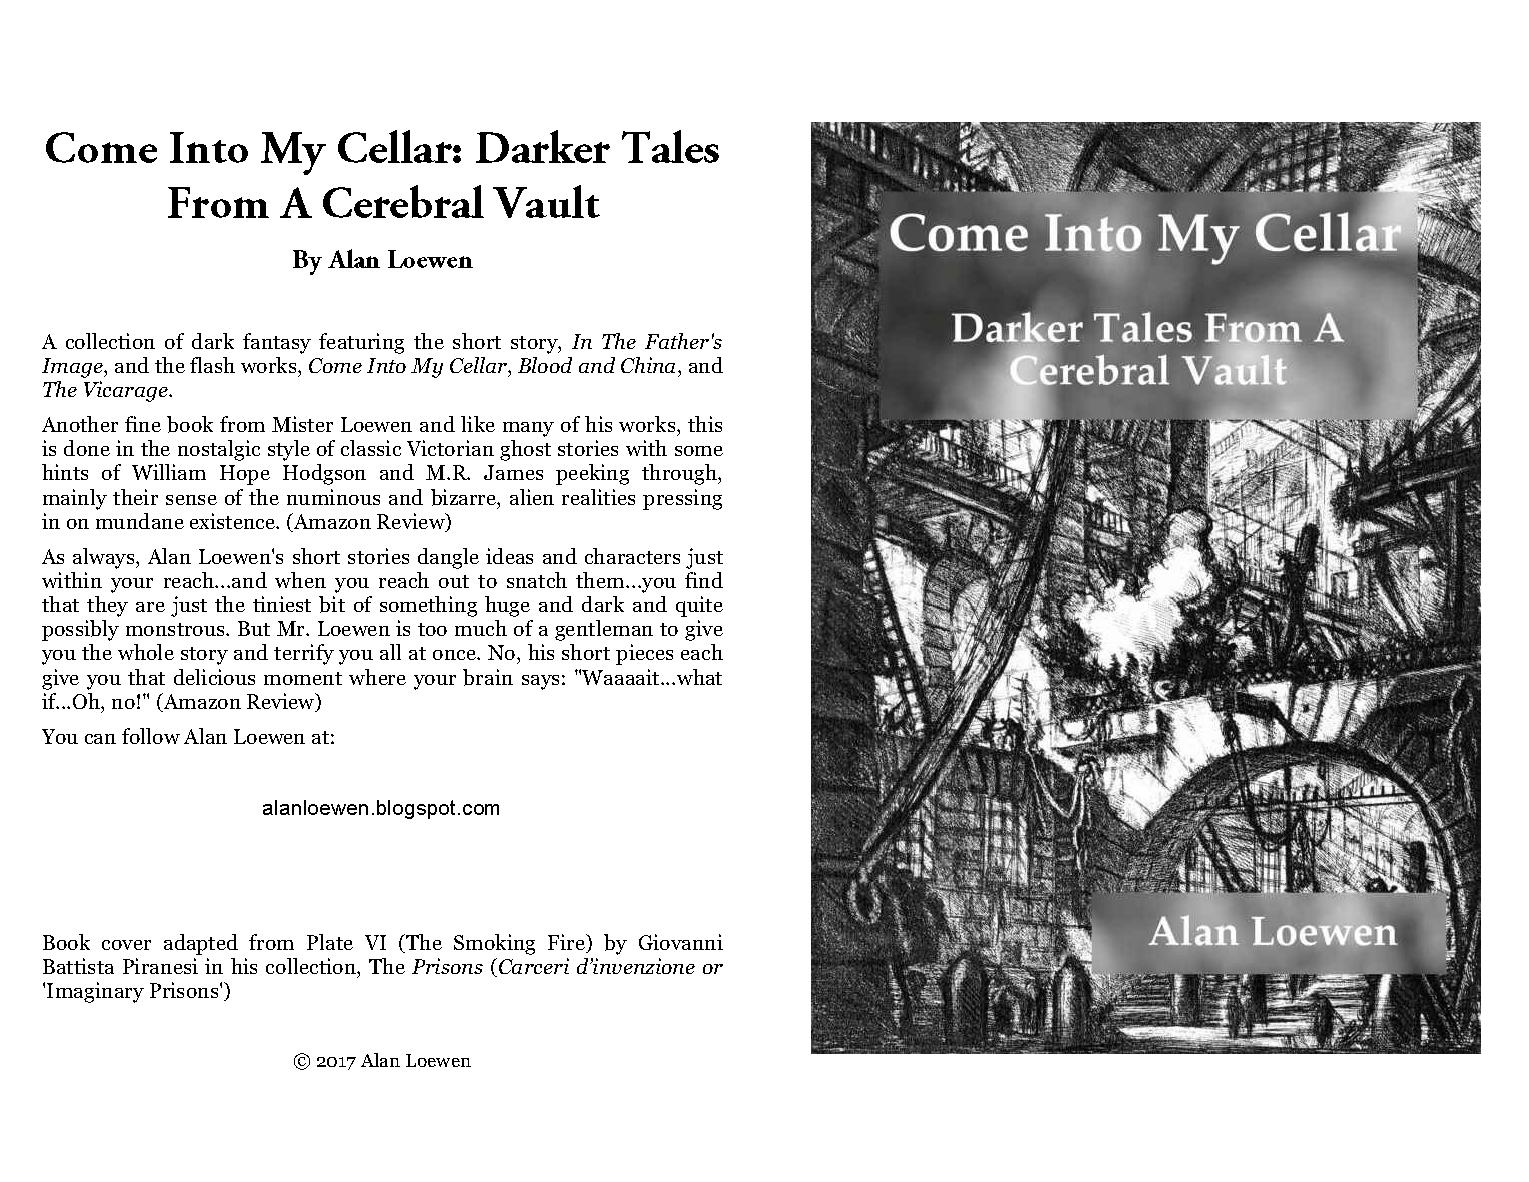 Alan Loewen Author Storyteller Dreamer Book Covers As Greeting Cards